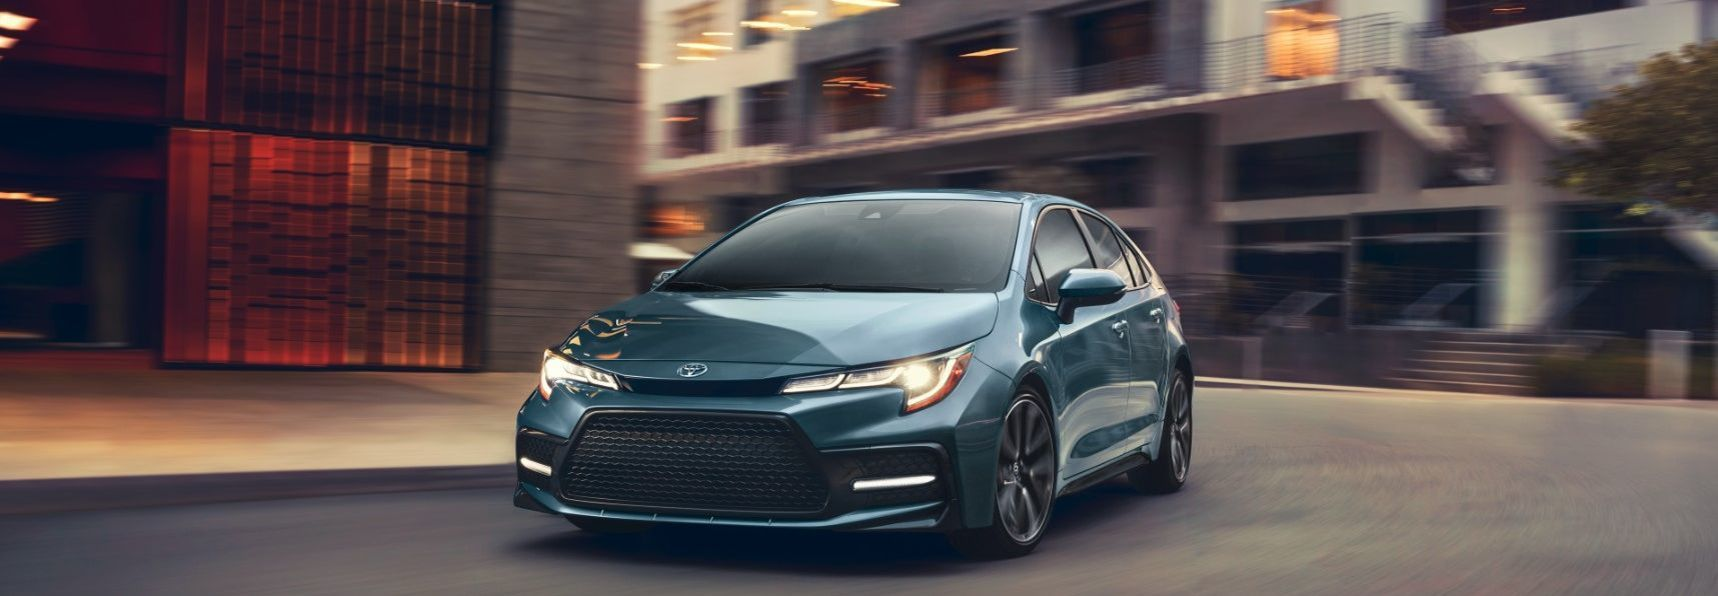 2020 Toyota Corolla Financing near Milpitas, CA